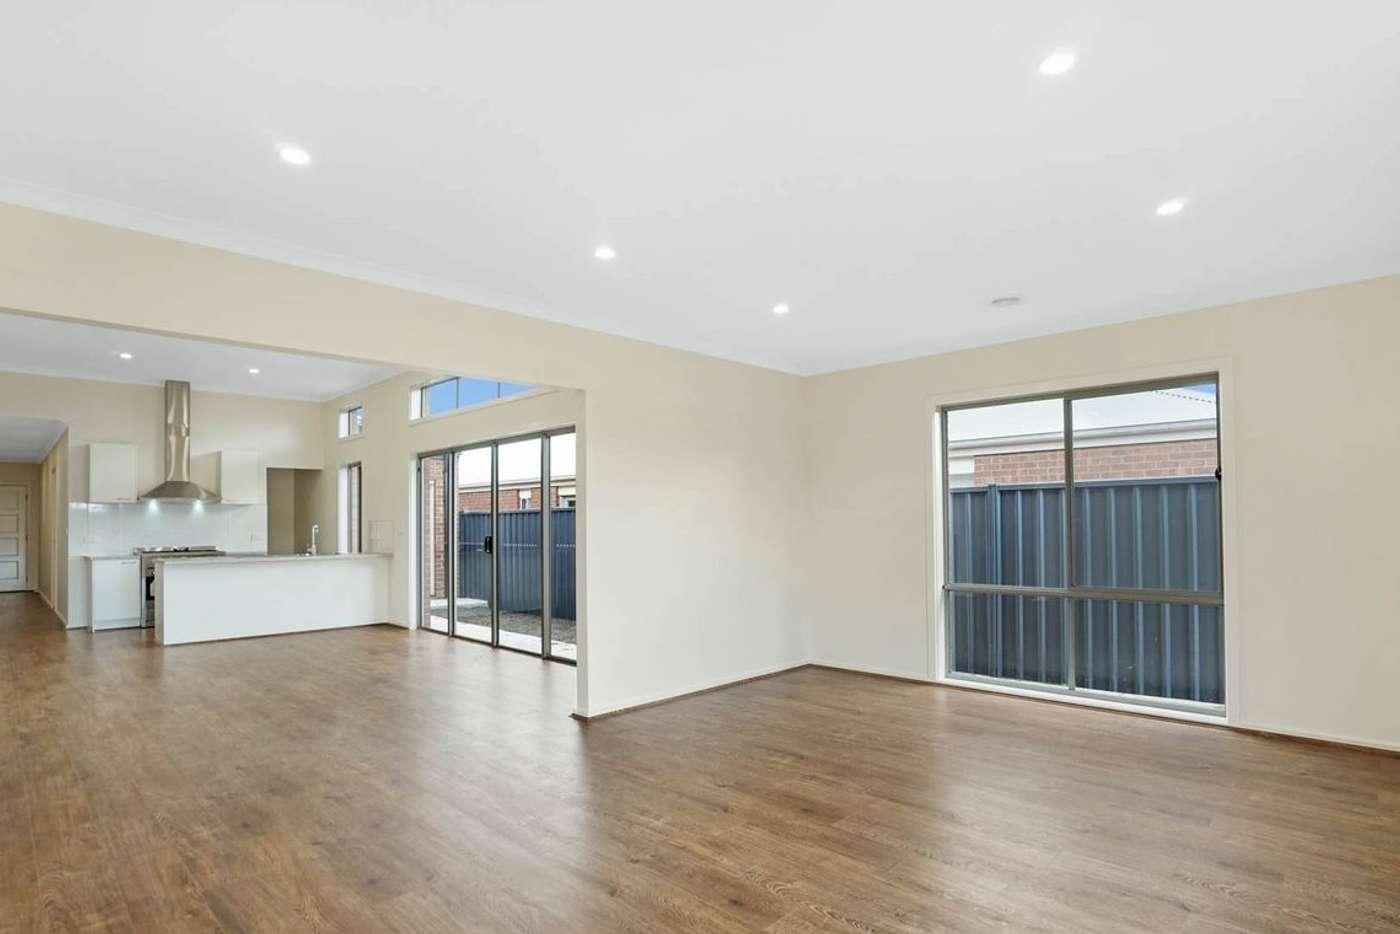 Seventh view of Homely house listing, 11 Wonnangatta Crescent, Weir Views VIC 3338